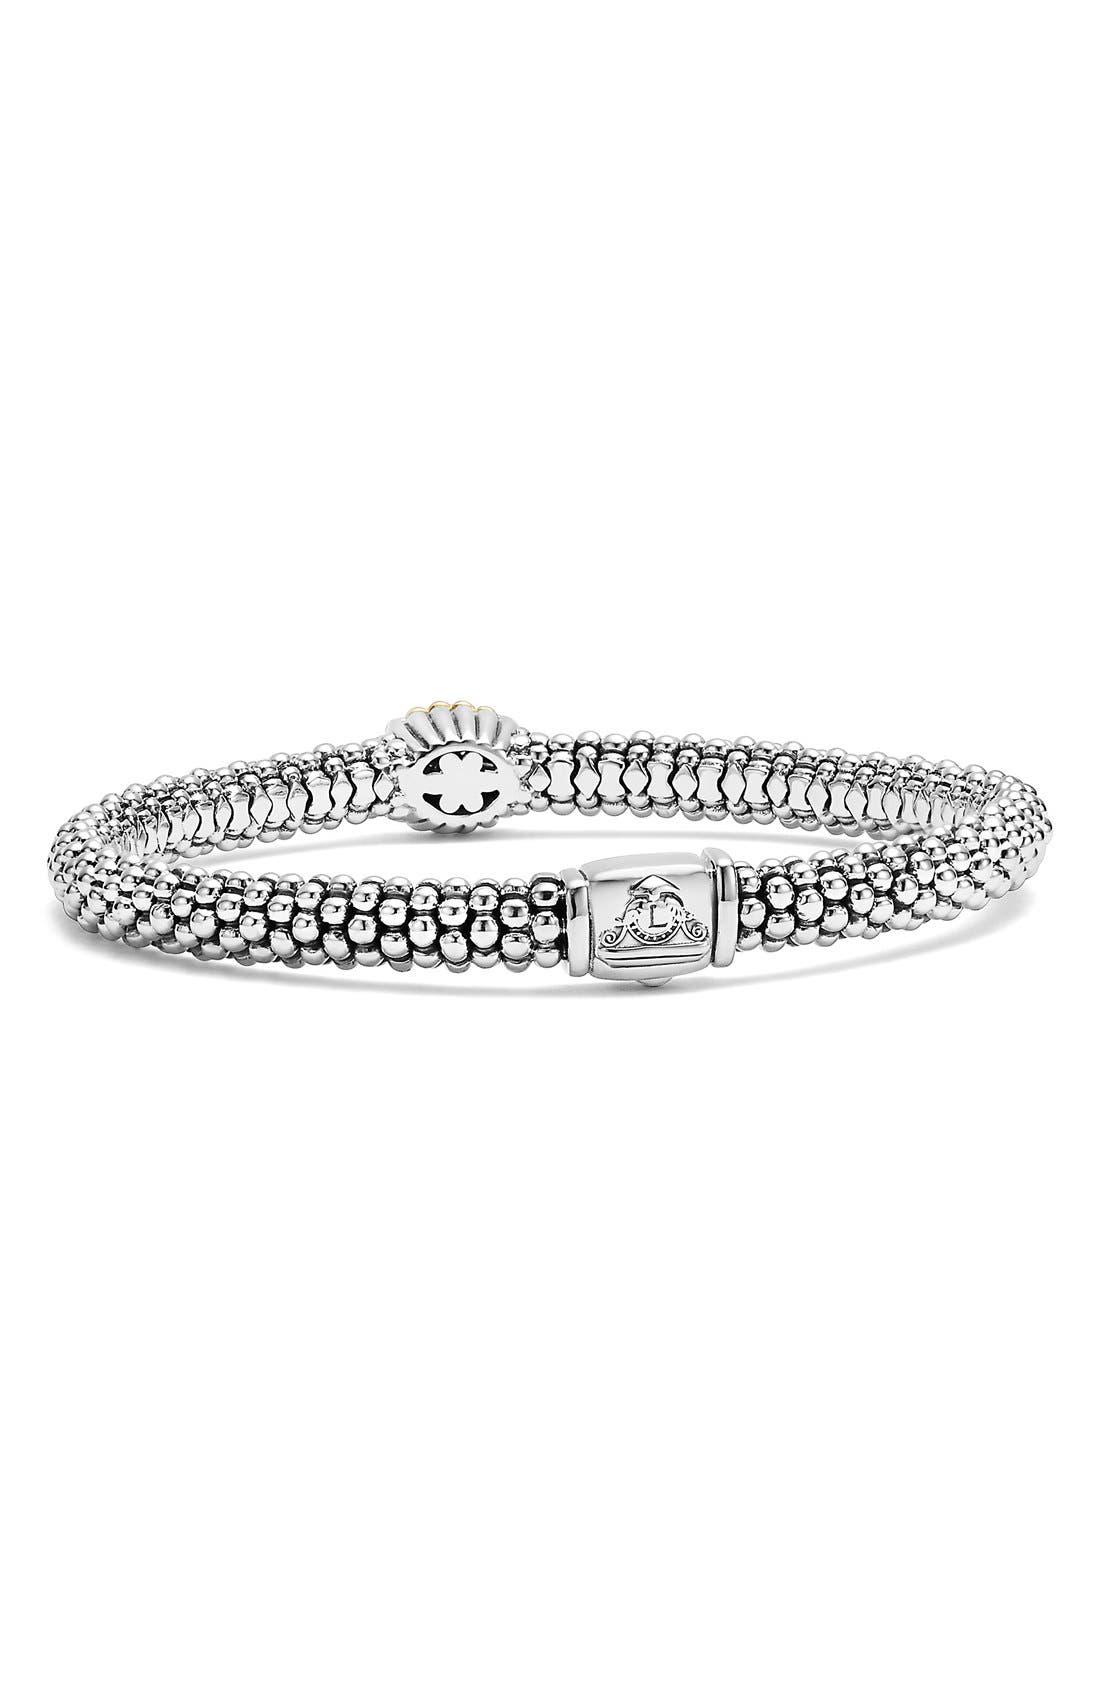 Diamond Caviar Oval Bracelet,                             Alternate thumbnail 4, color,                             040